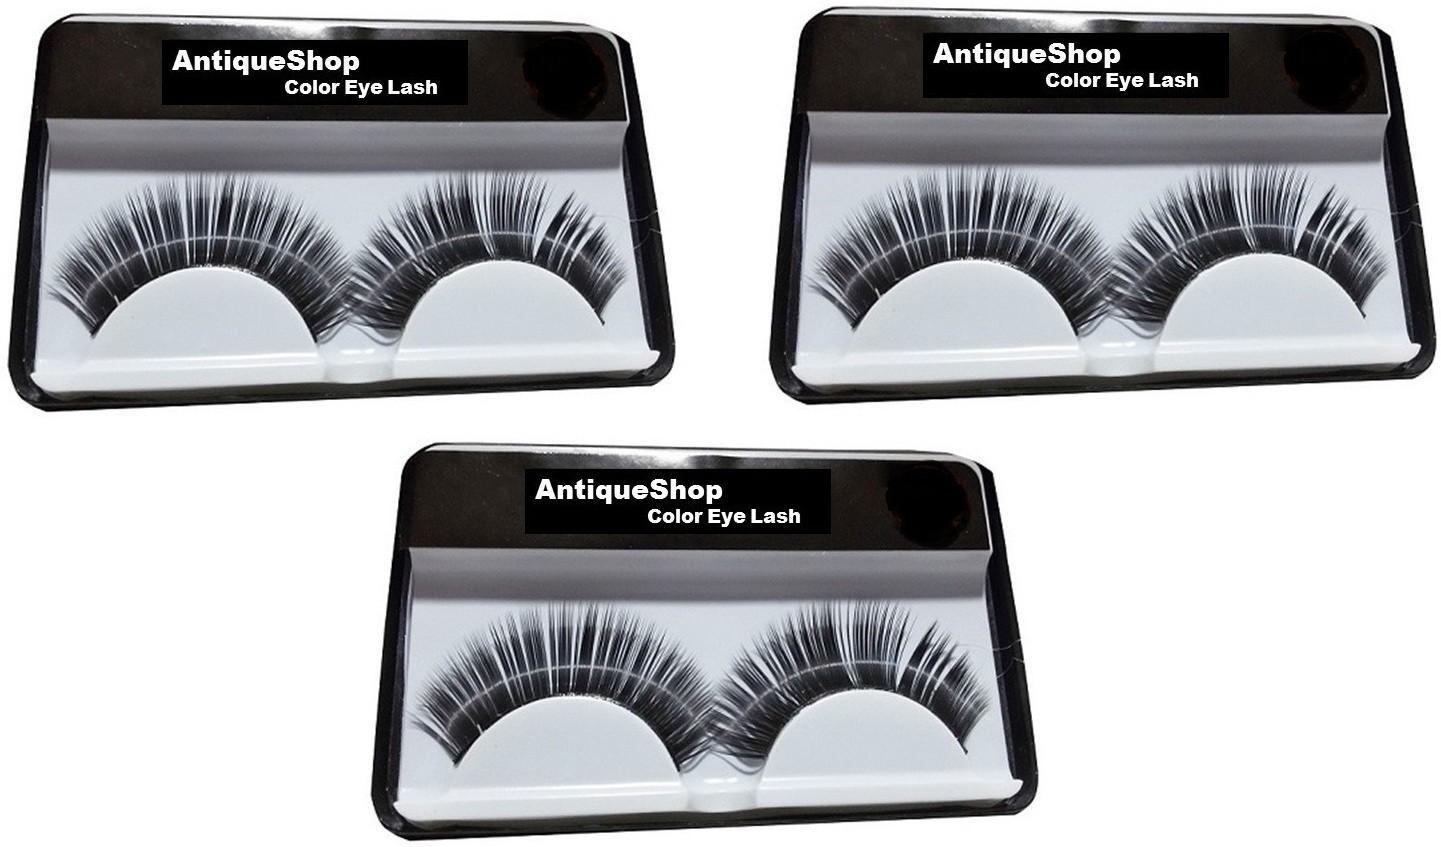 d13d79f2c50 Antique Shop Day & Night Stylish False Eyelashes Pack of 3(Pack of 3)